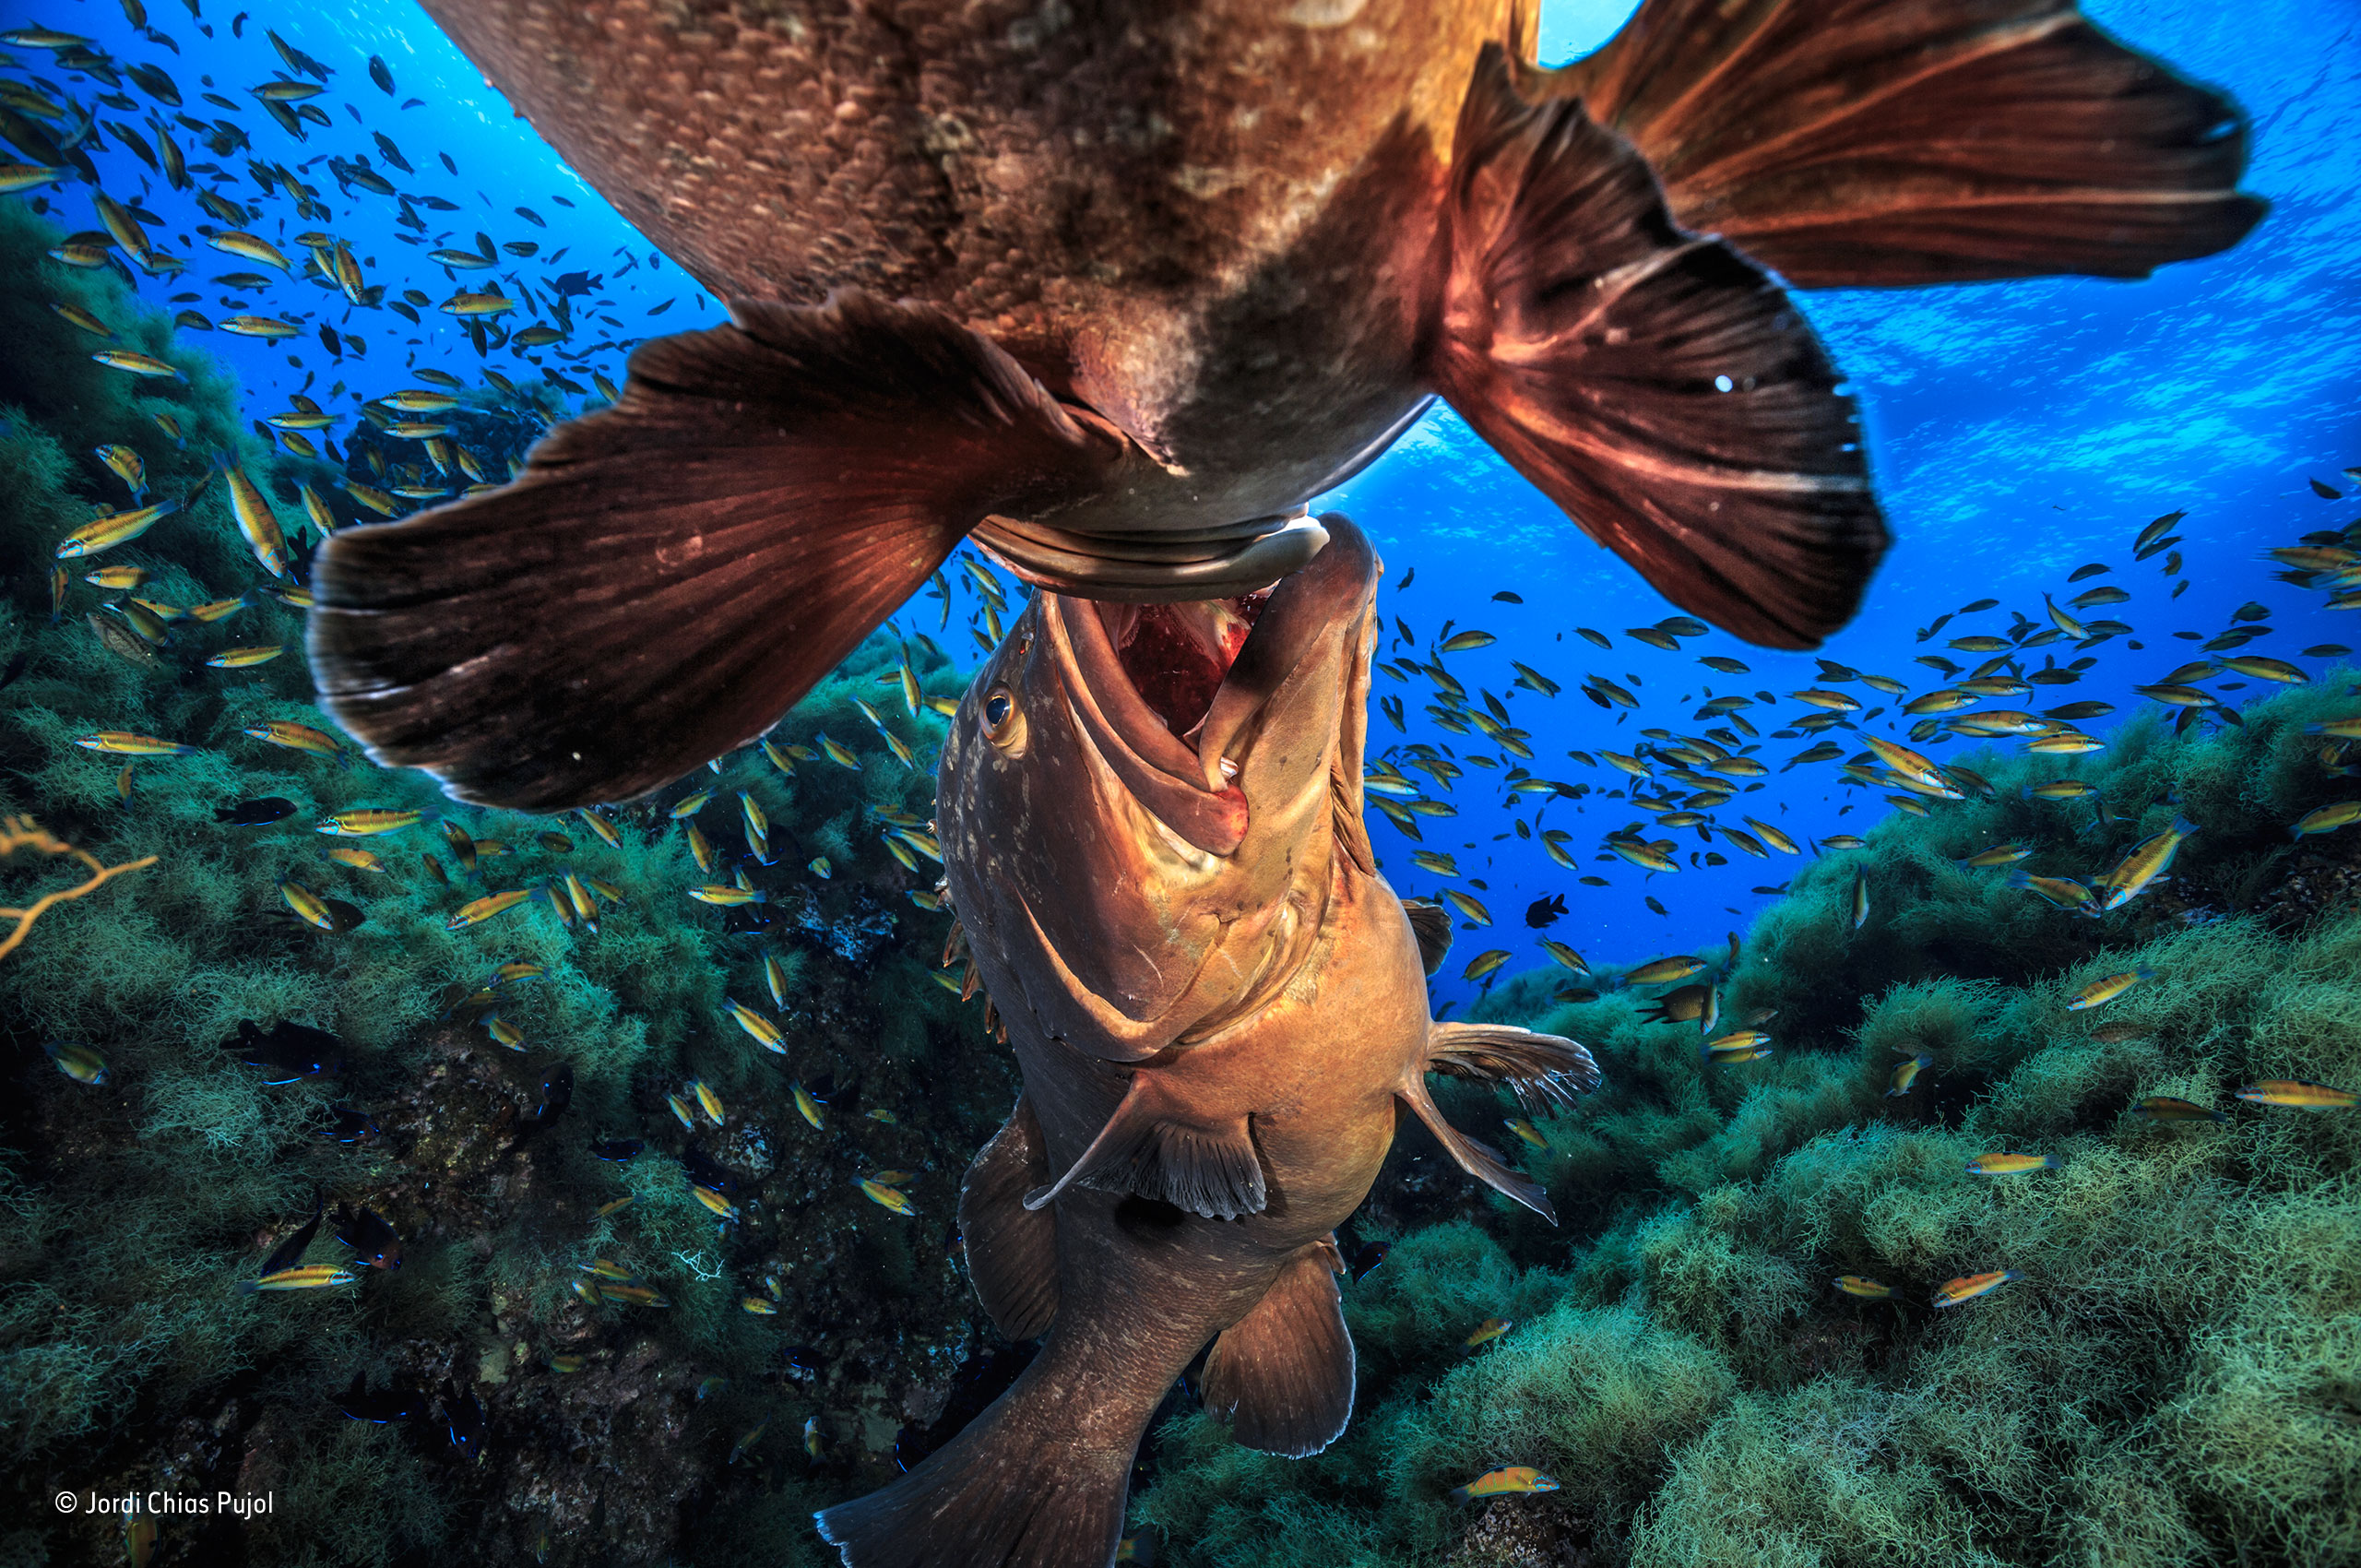 The disappearing fish iago leonardo reptiles for The big fish